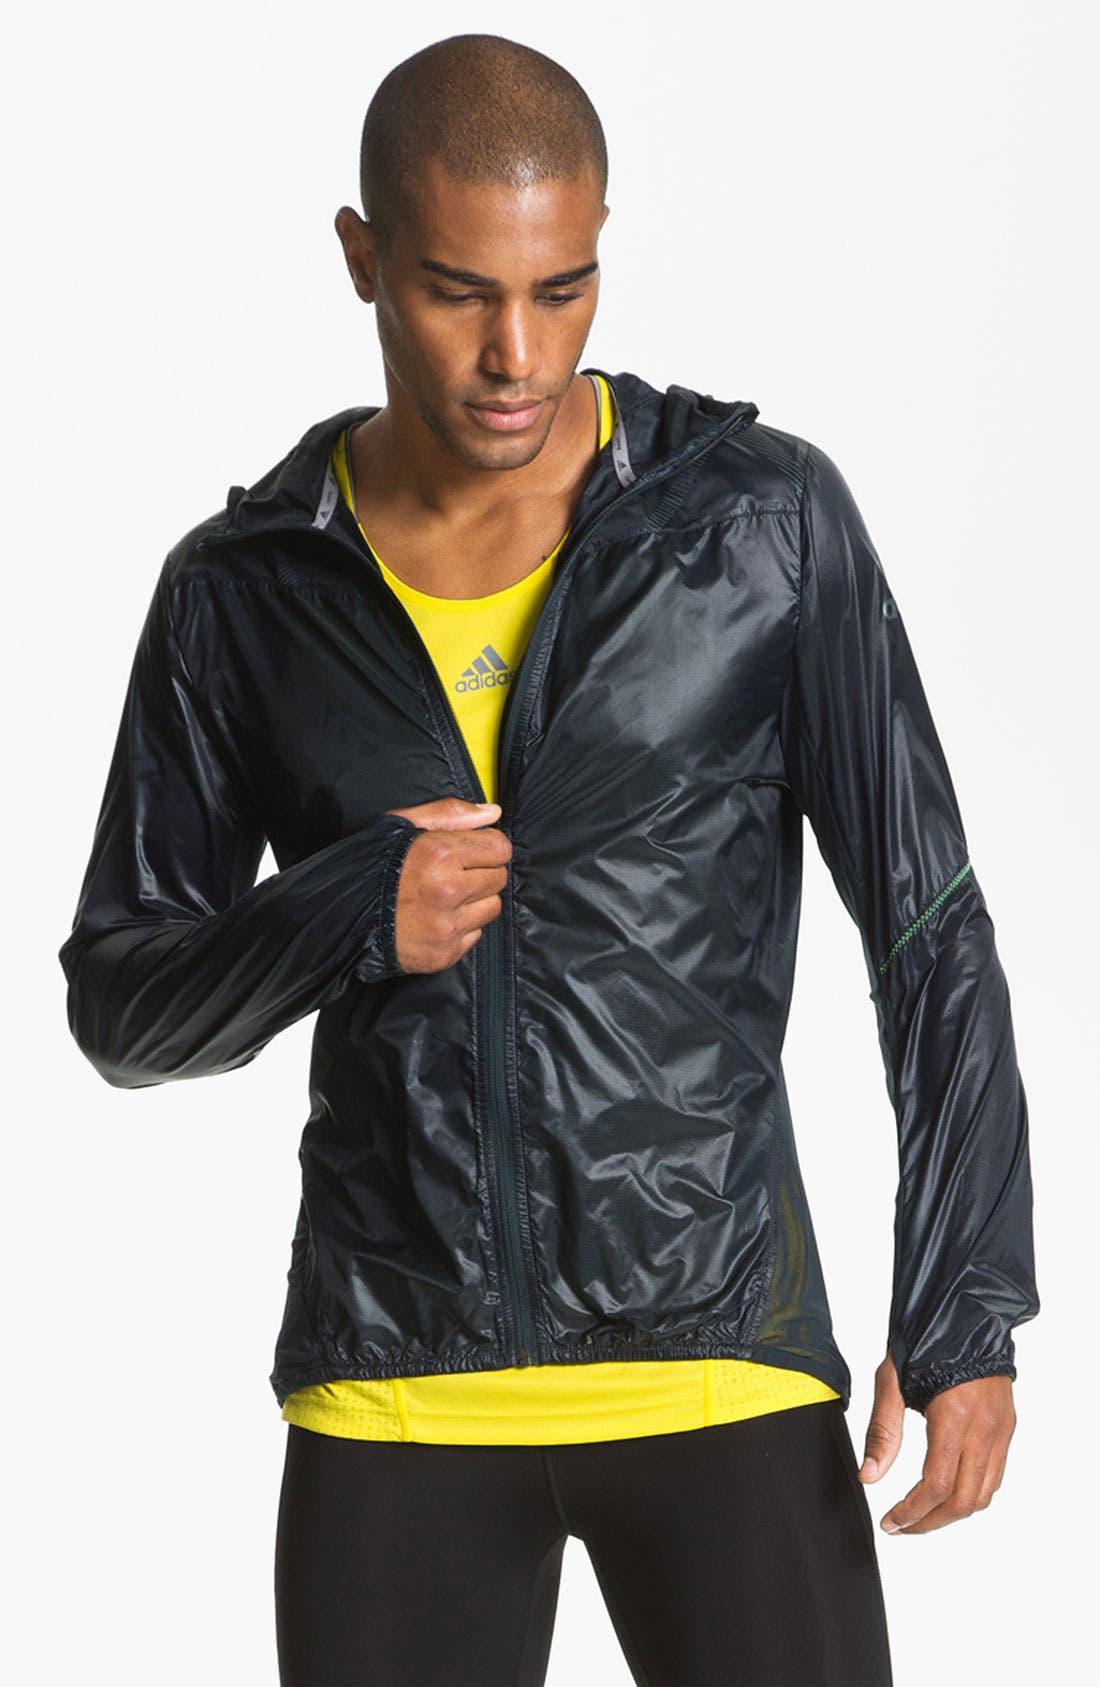 Main Image - adidas 'Fast Roadrunner' Jacket